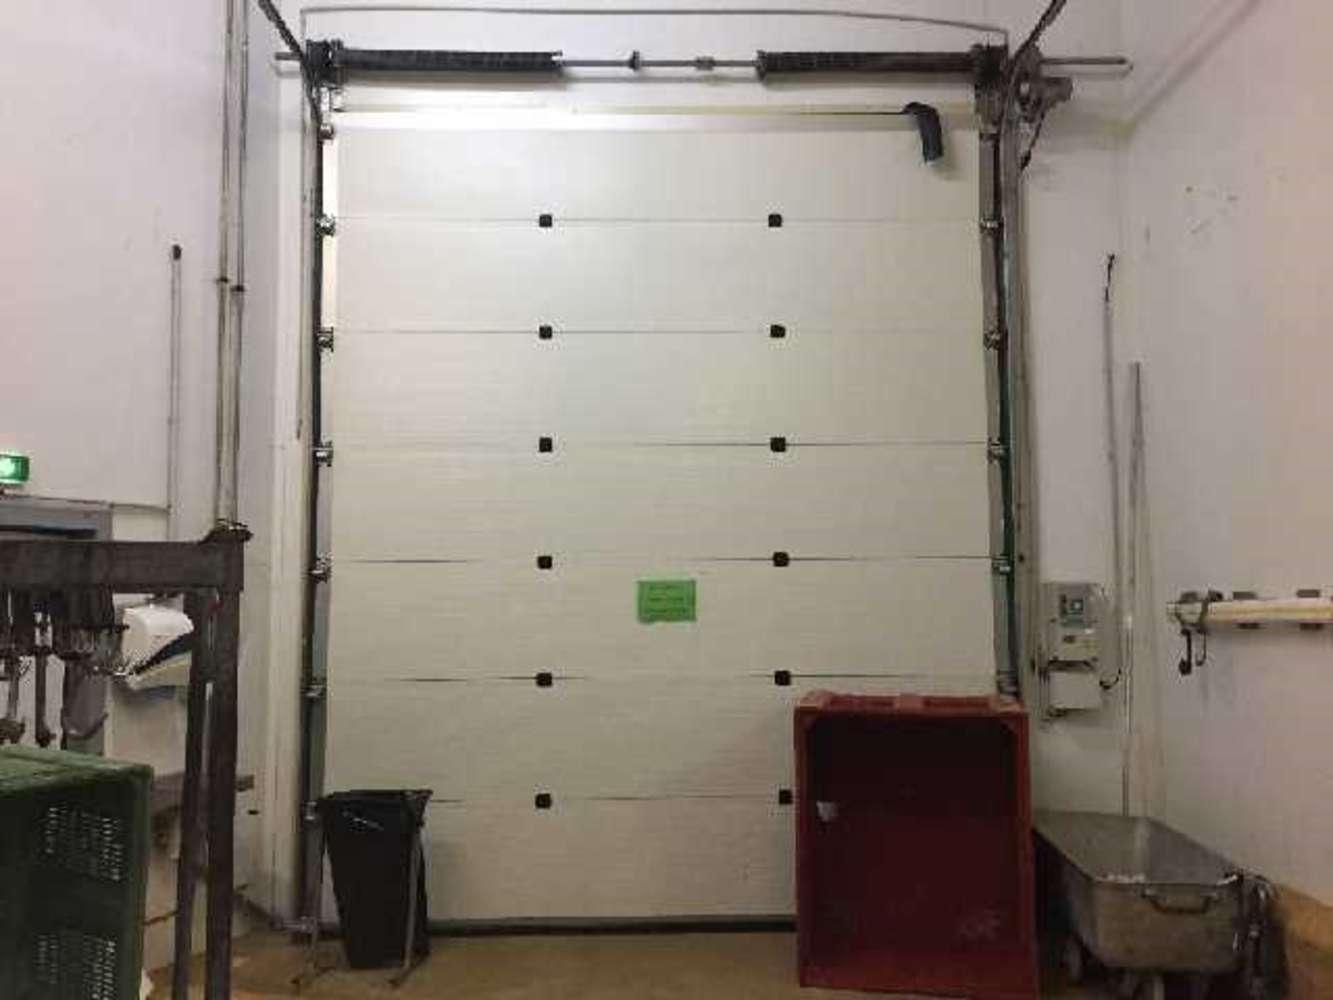 Activités/entrepôt Corbas, 69960 - Location entrepot Corbas - Type Froid - 9802493